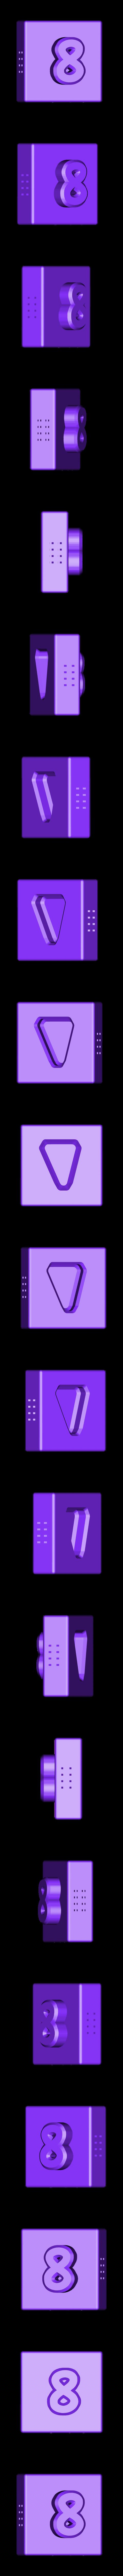 8.stl Download free STL file Mental blocks • Object to 3D print, RevK